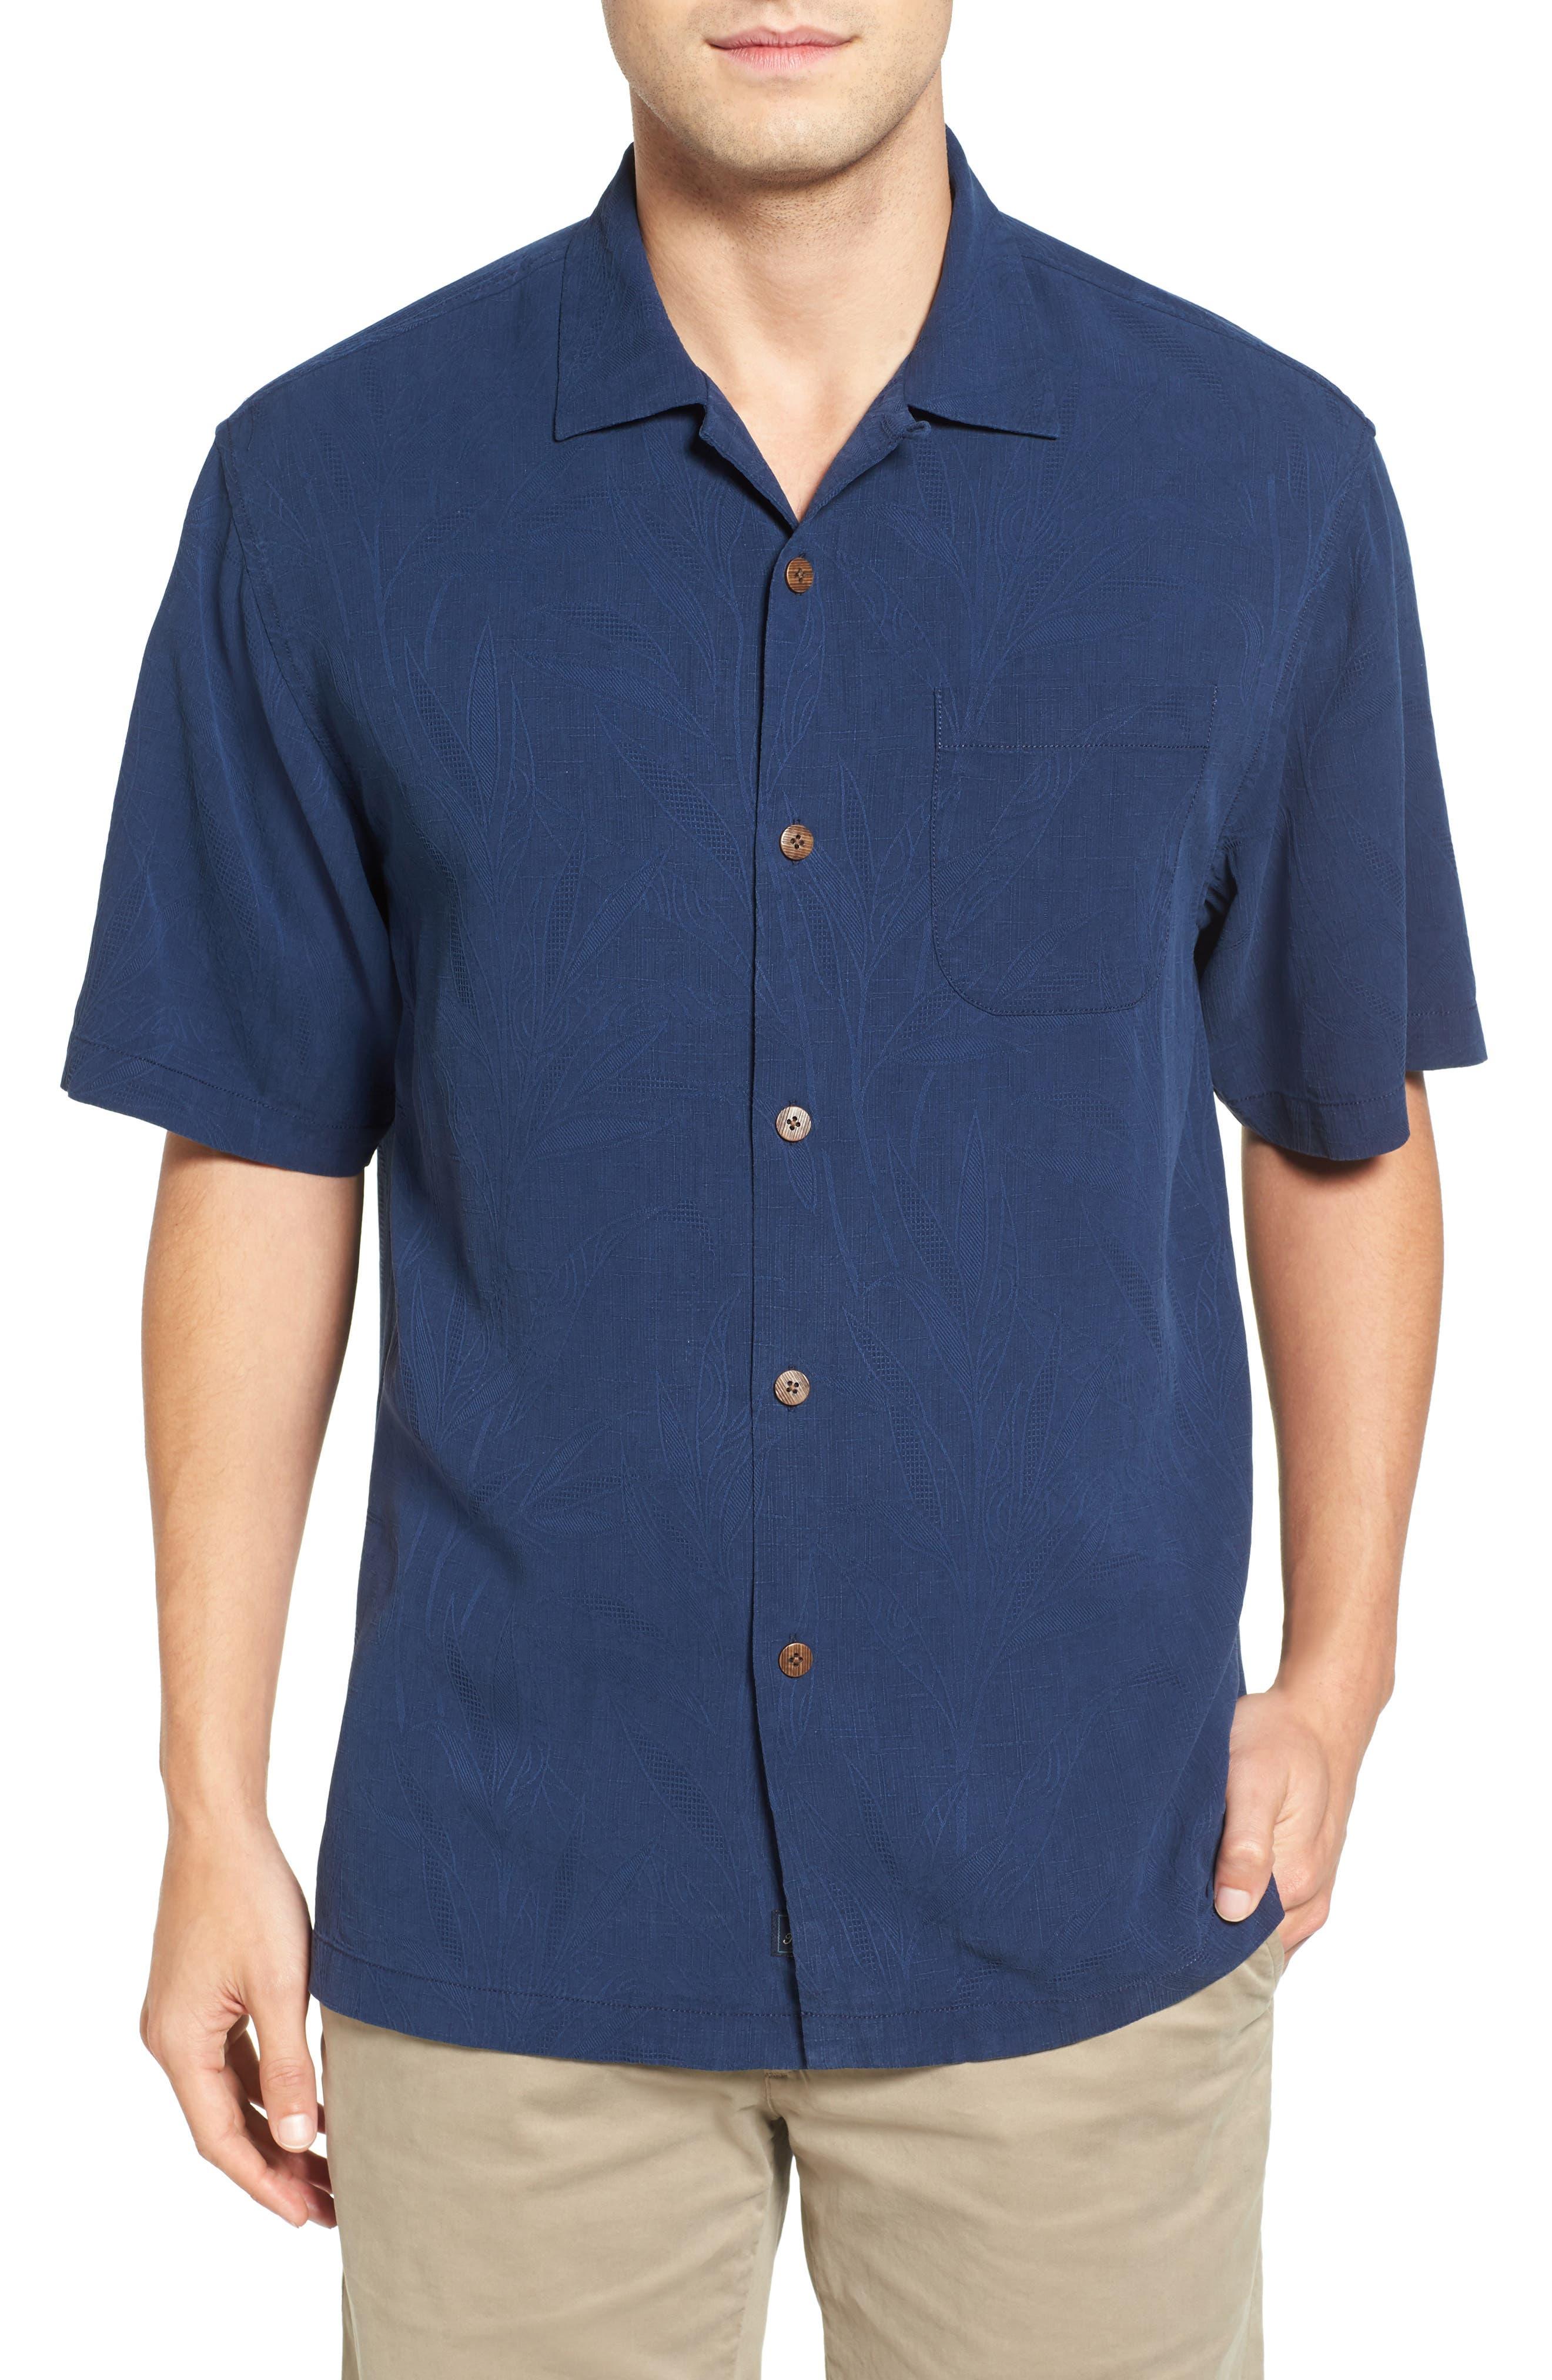 Alternate Image 1 Selected - Tommy Bahama Islander Fronds Silk Camp Shirt